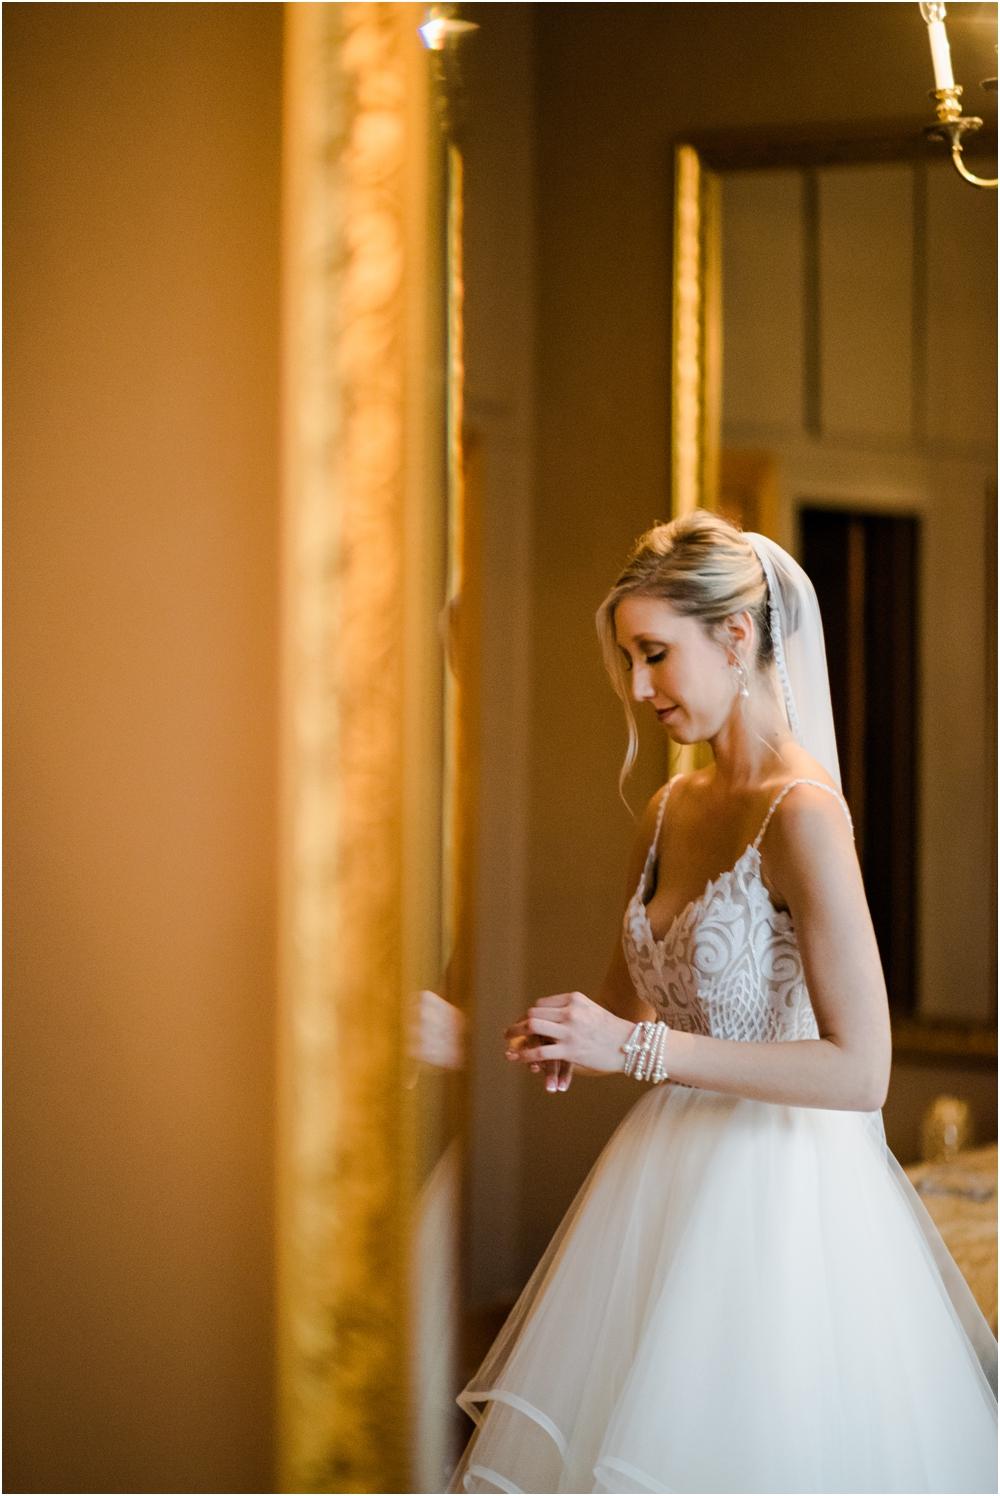 oconnor-pensacola-florida-wedding-photographer-kiersten-taylor-30.jpg